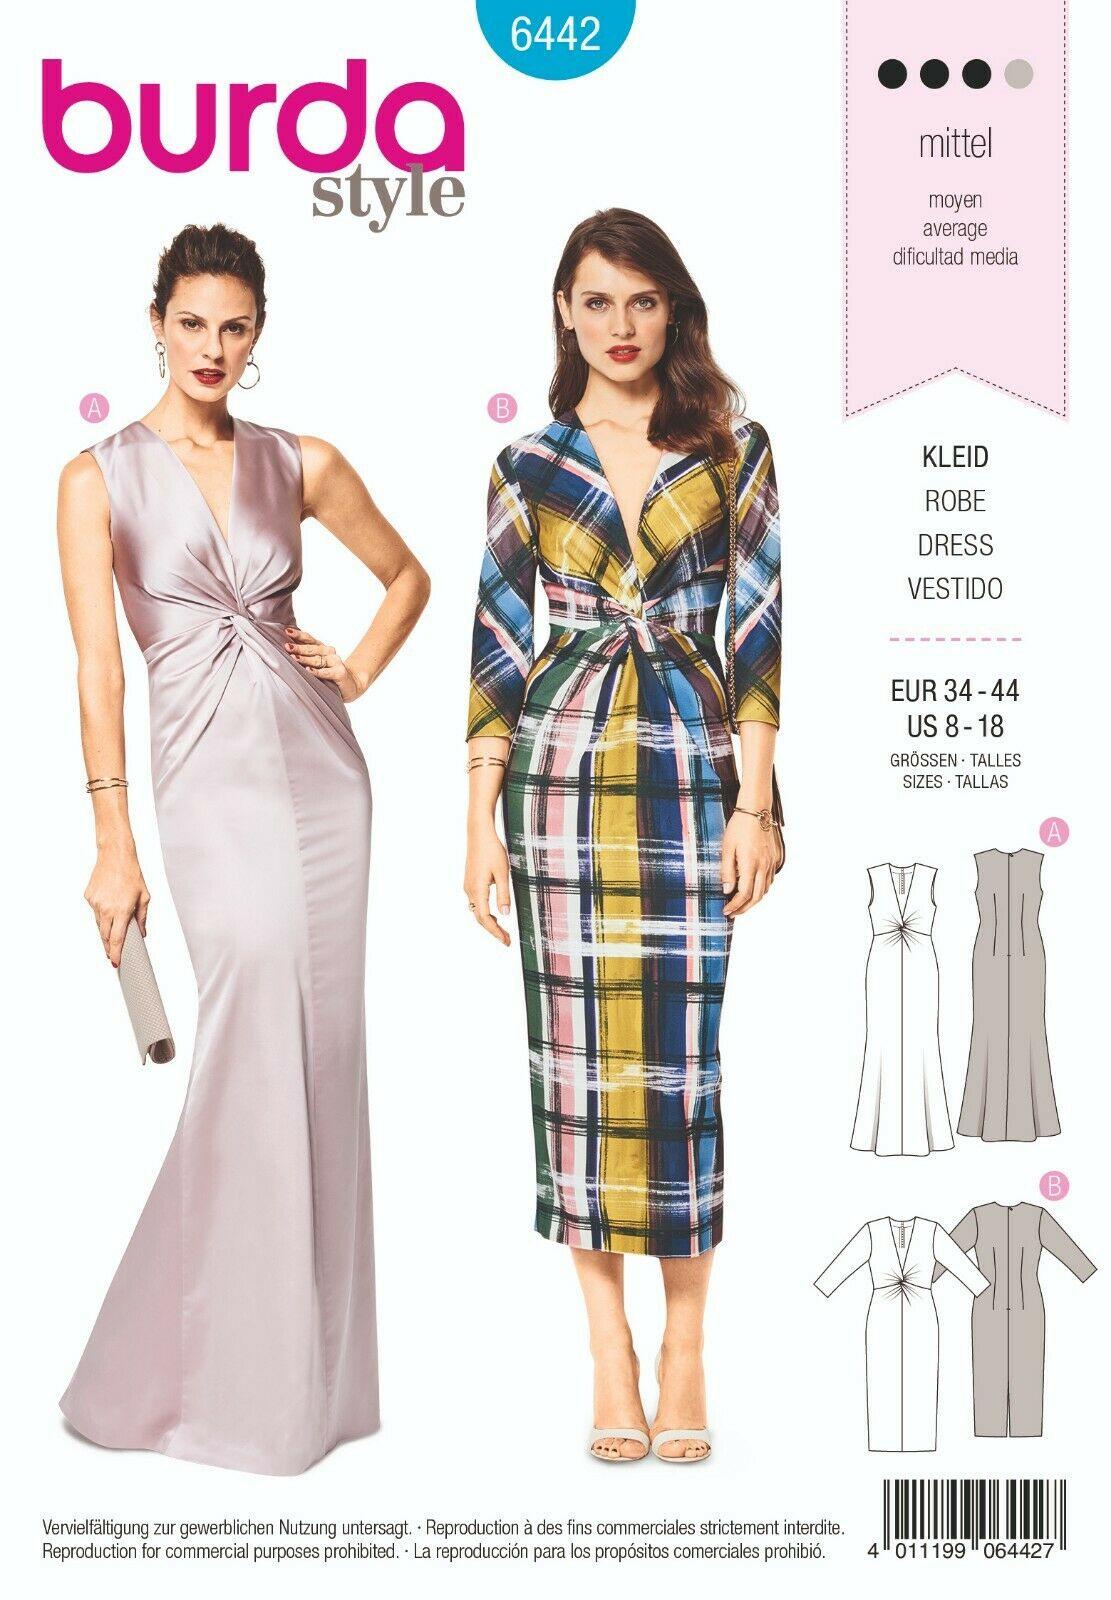 13 Schön Burda Abendkleid Vertrieb20 Elegant Burda Abendkleid Bester Preis